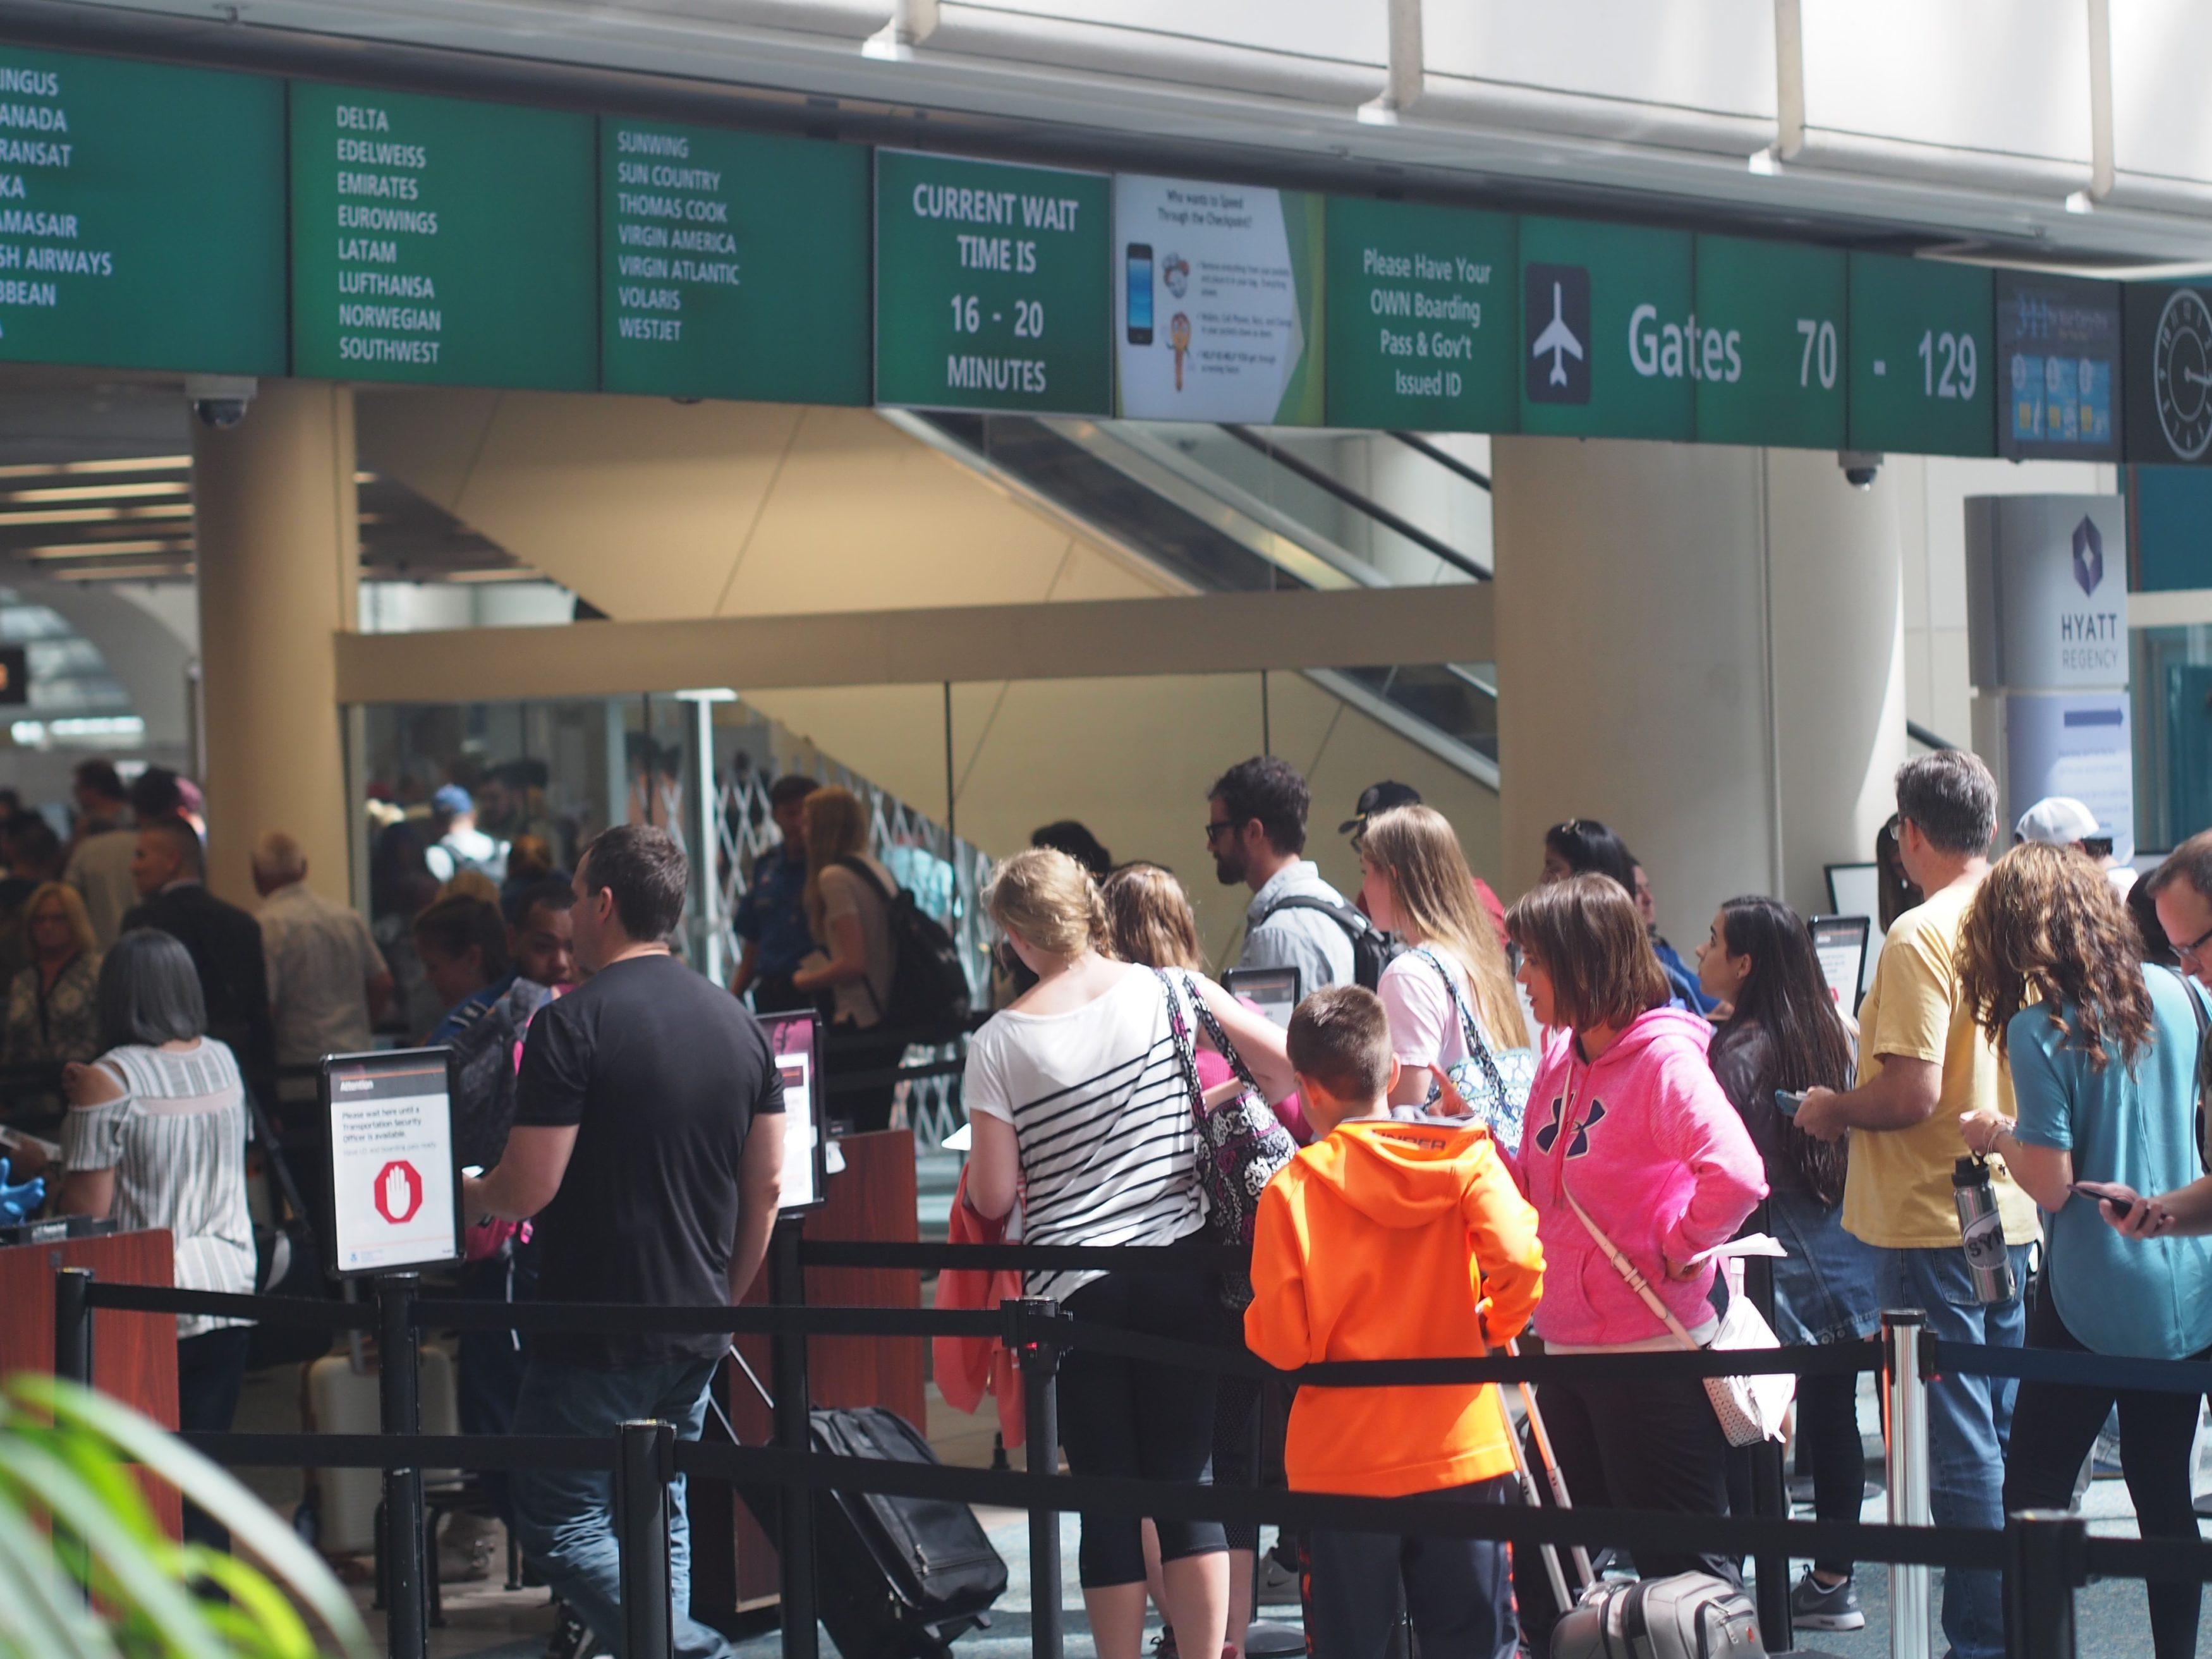 TSA-lines-at-OIA-3500x2625.jpg